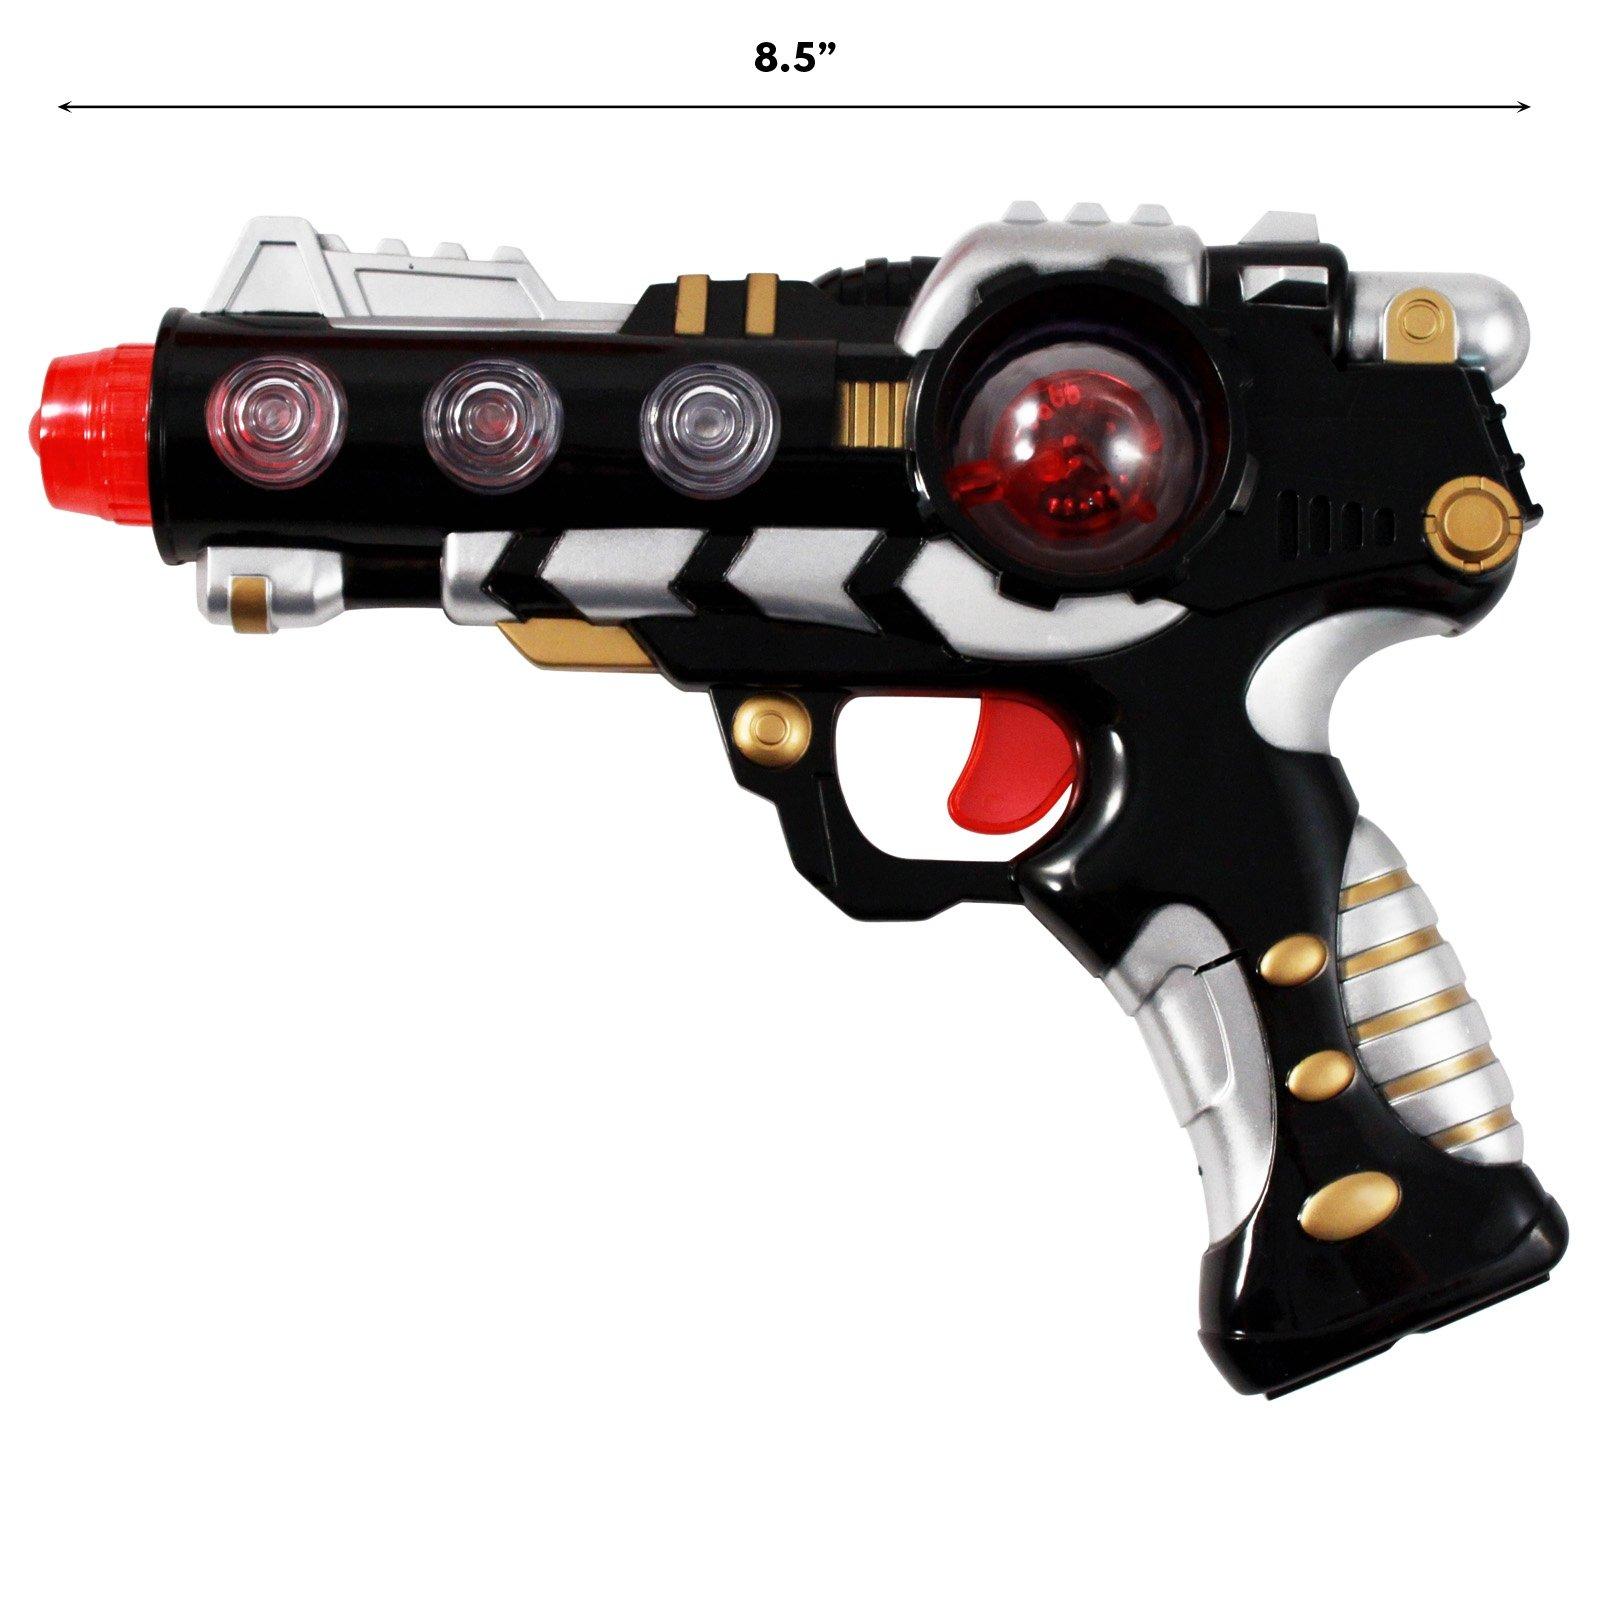 Intergalactic Superhero Laser Space Gun with Alternating Lights Sound - Black